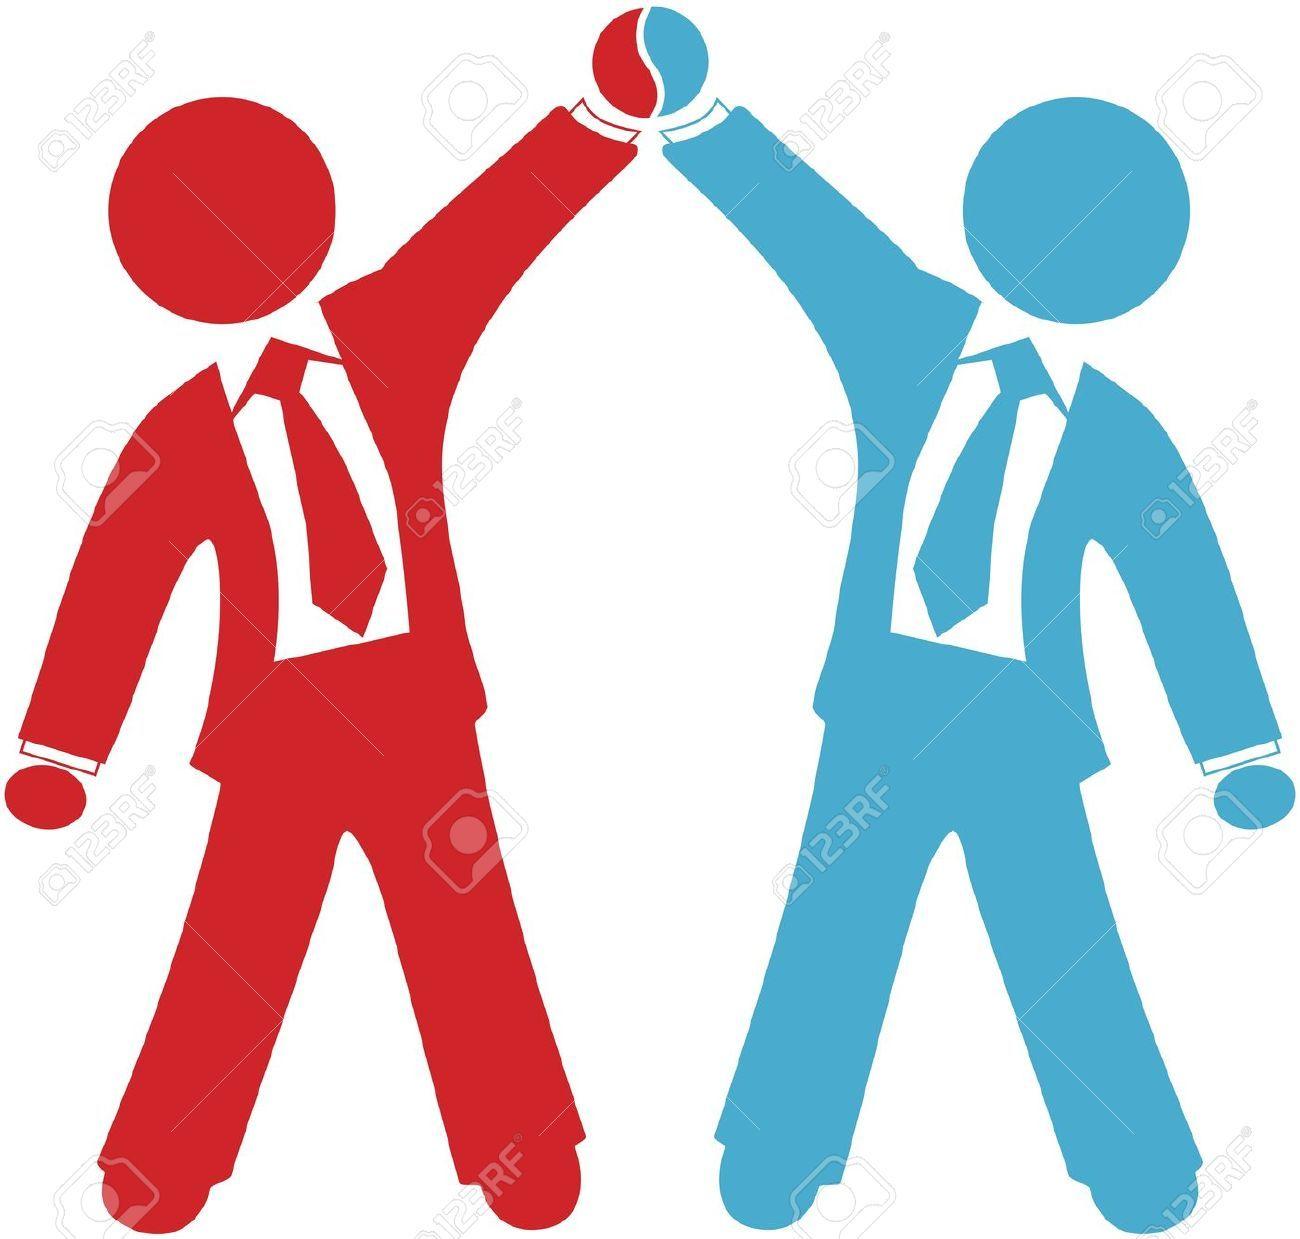 Business partnertship clipart svg freeuse download Business partnership clipart 1 » Clipart Portal svg freeuse download